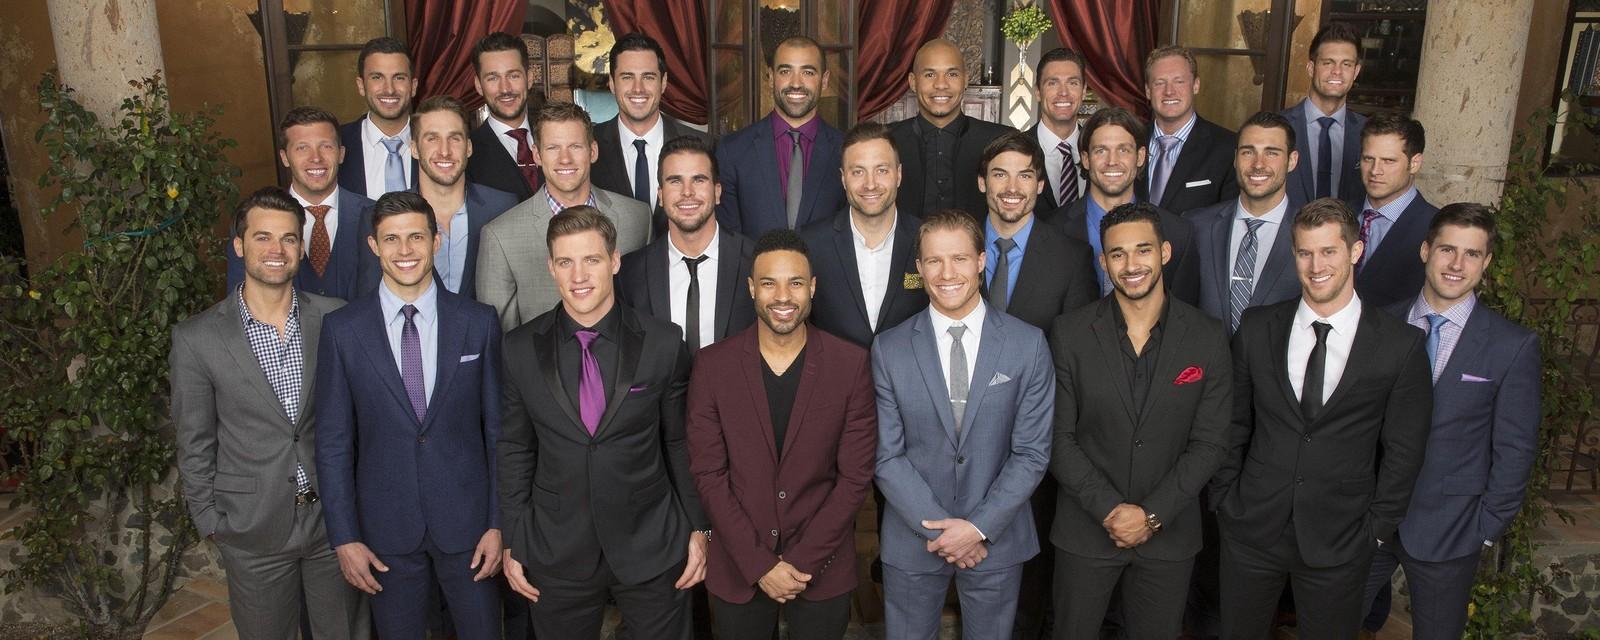 The Bachelorette Season 11 Contestants Announced